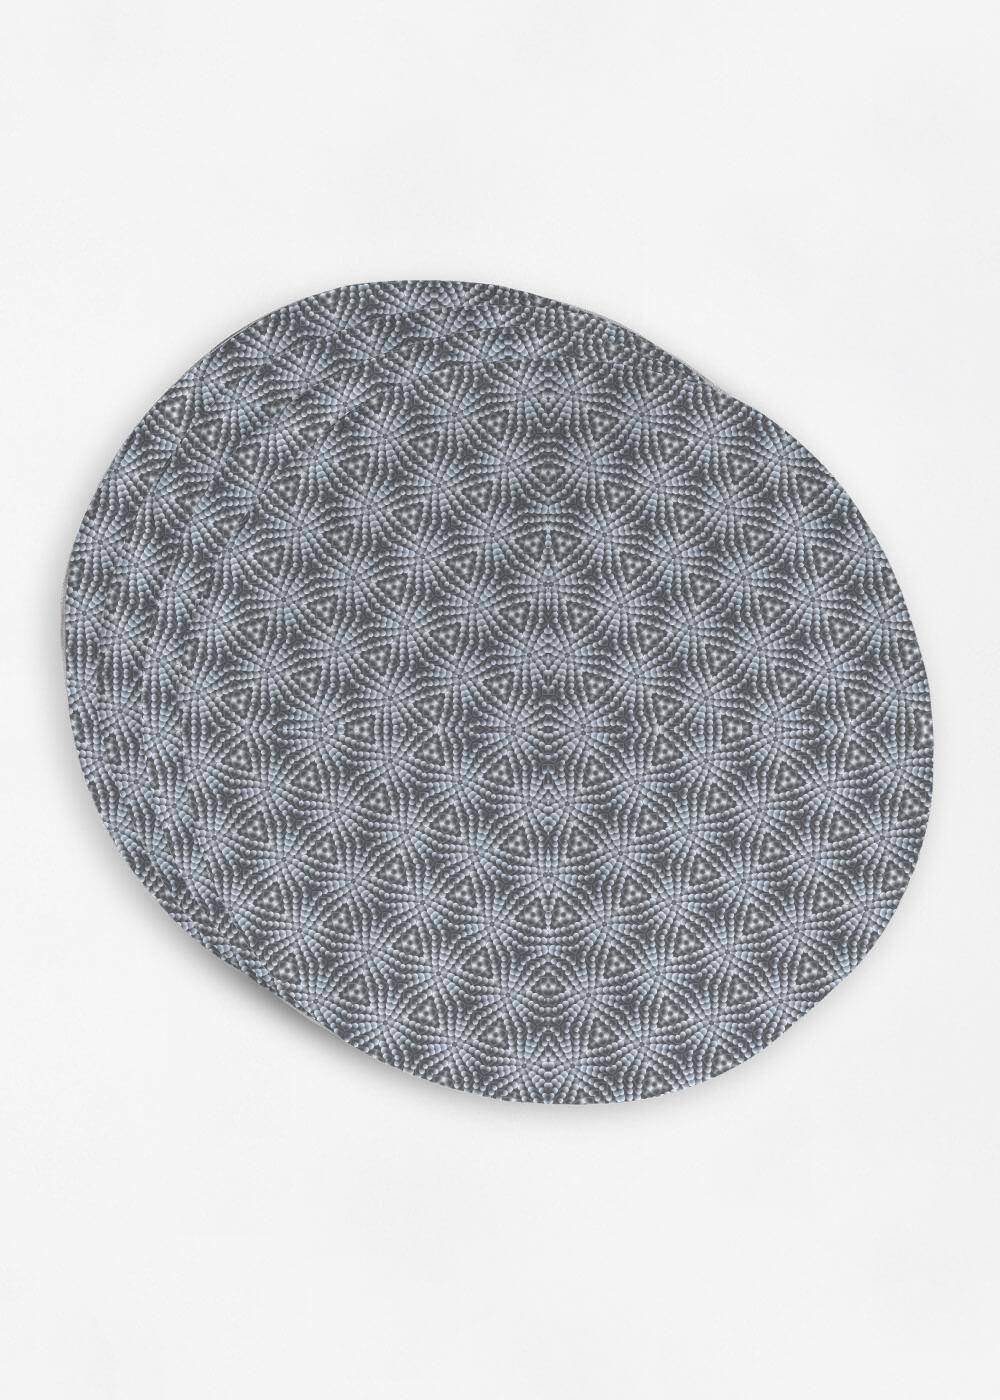 Grey Geometric Fractals Geometric Placemat Sets Placemats